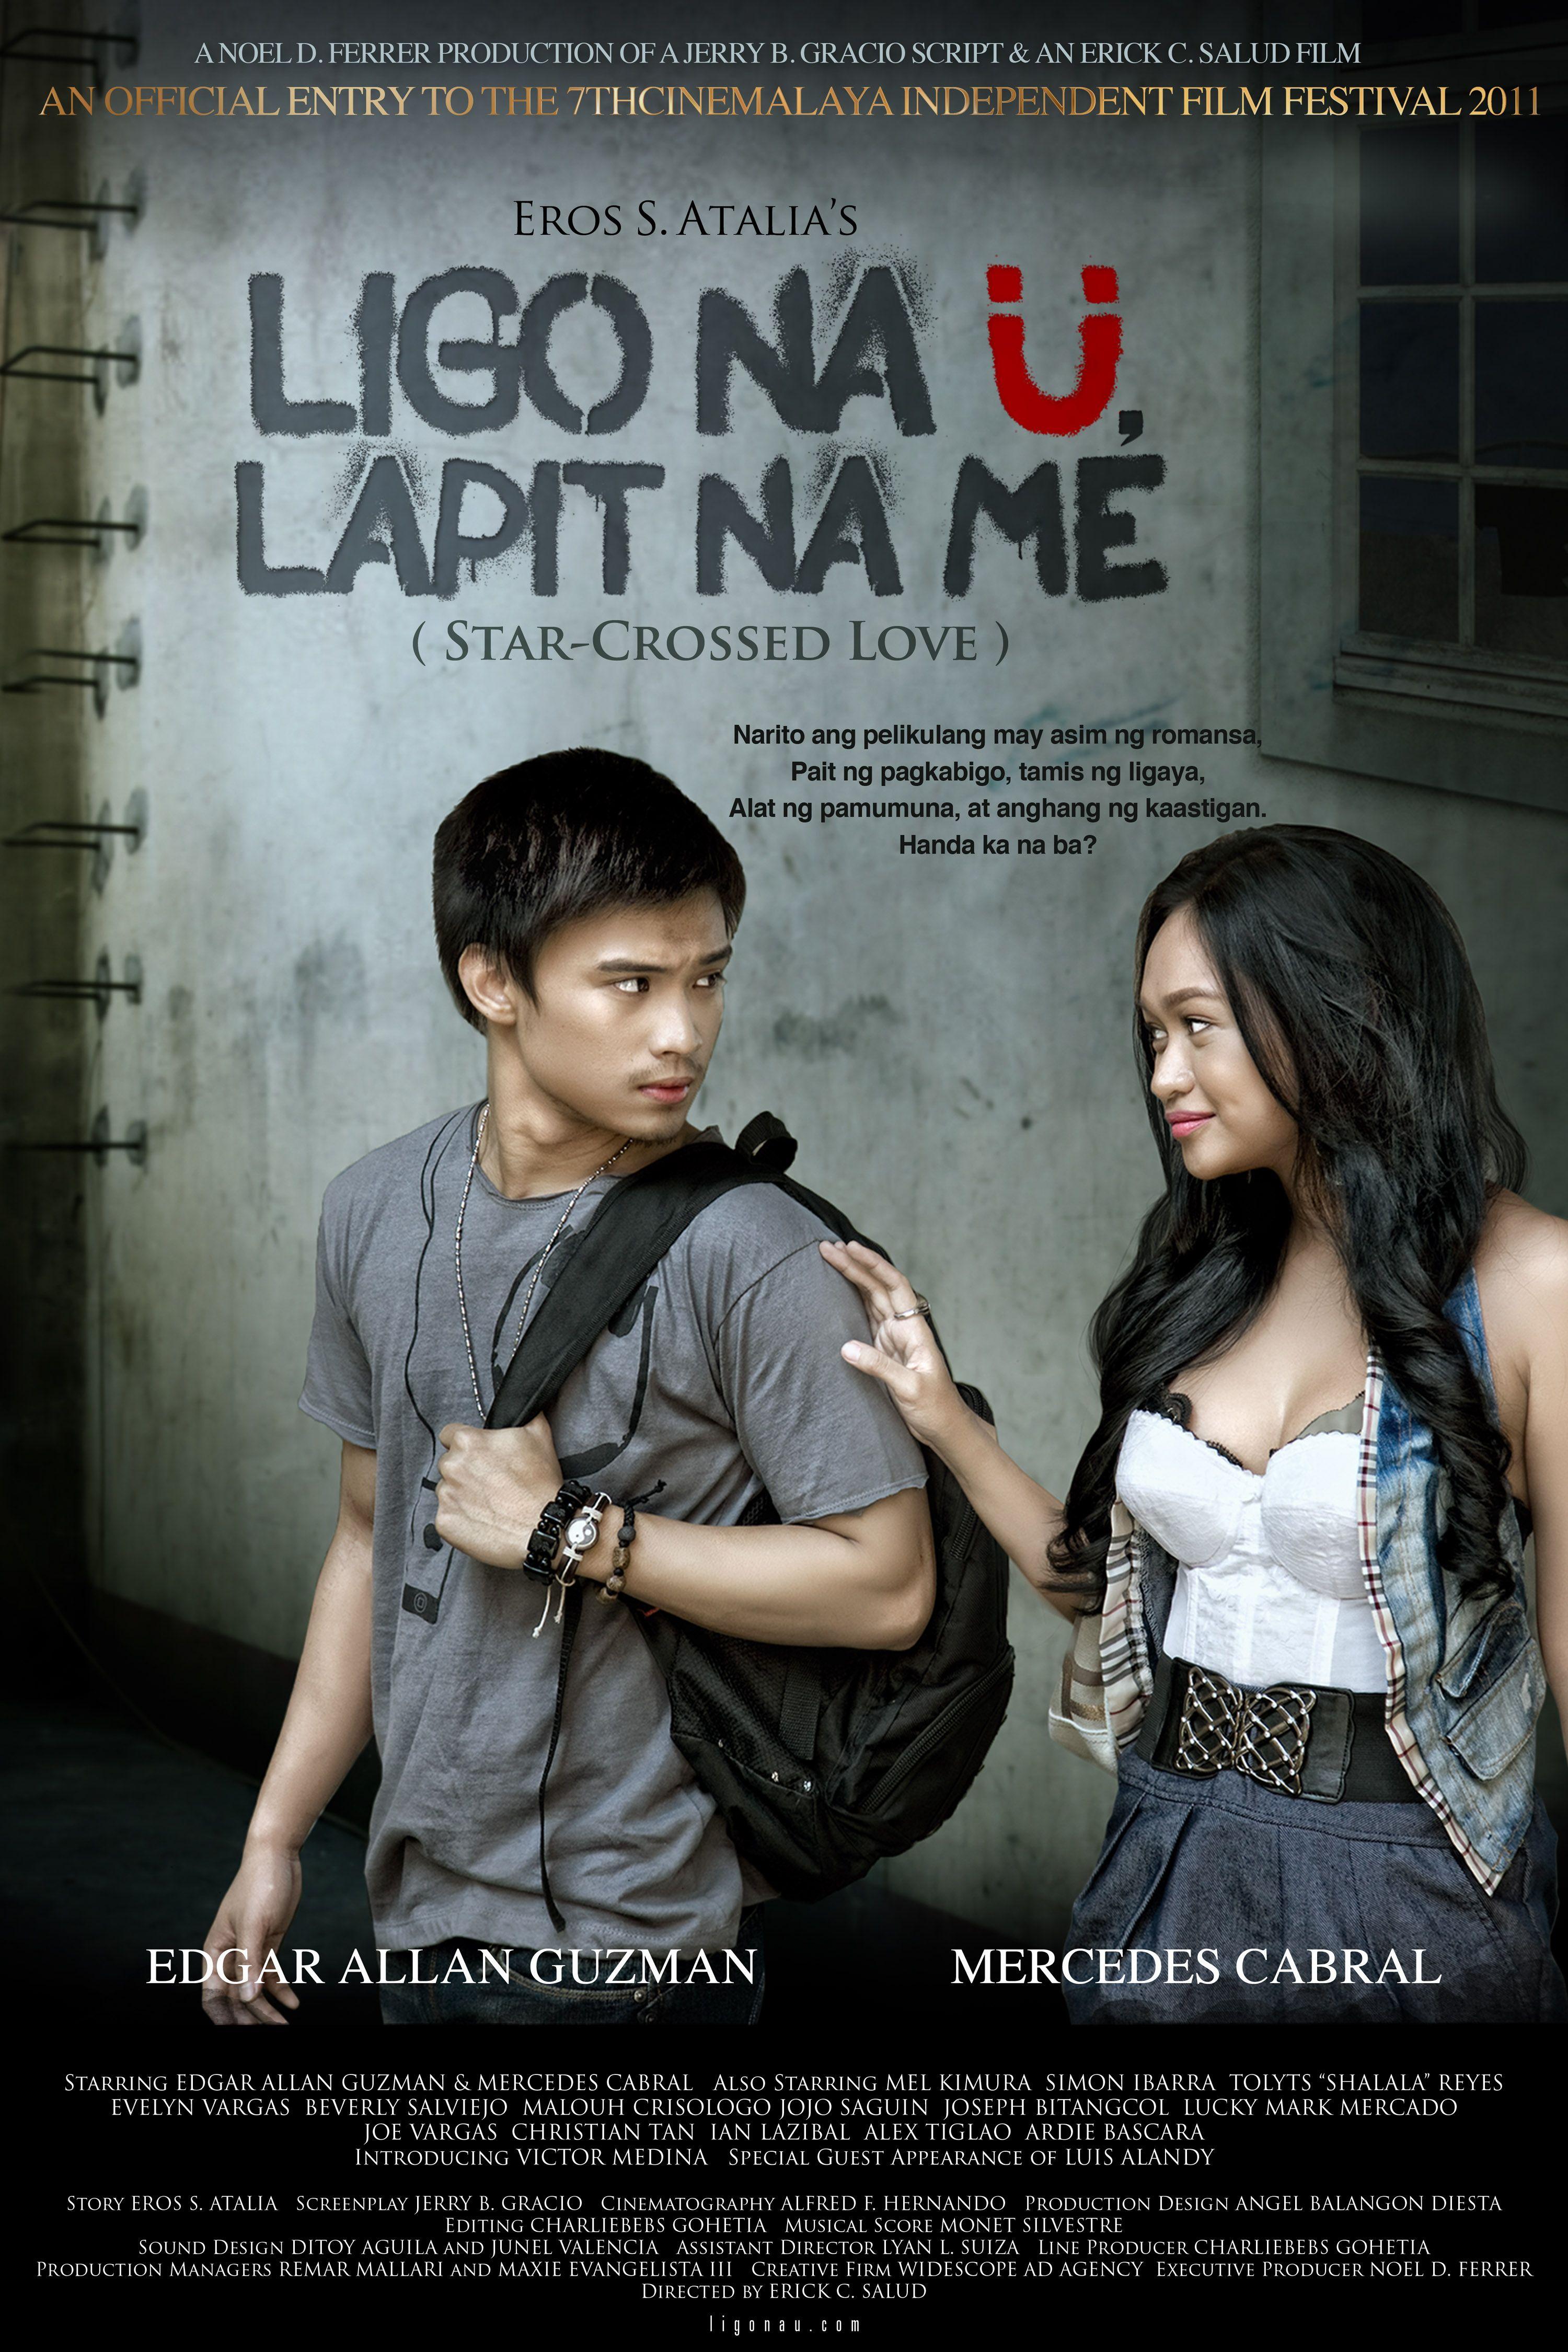 Ligo Na U Lapit Na Me 2011 Philippinefilm Asianfilm Cinemalaya Pelikula Indiefilm Film Movie Philippinecinema Tagalog Tagalogfilm Indie